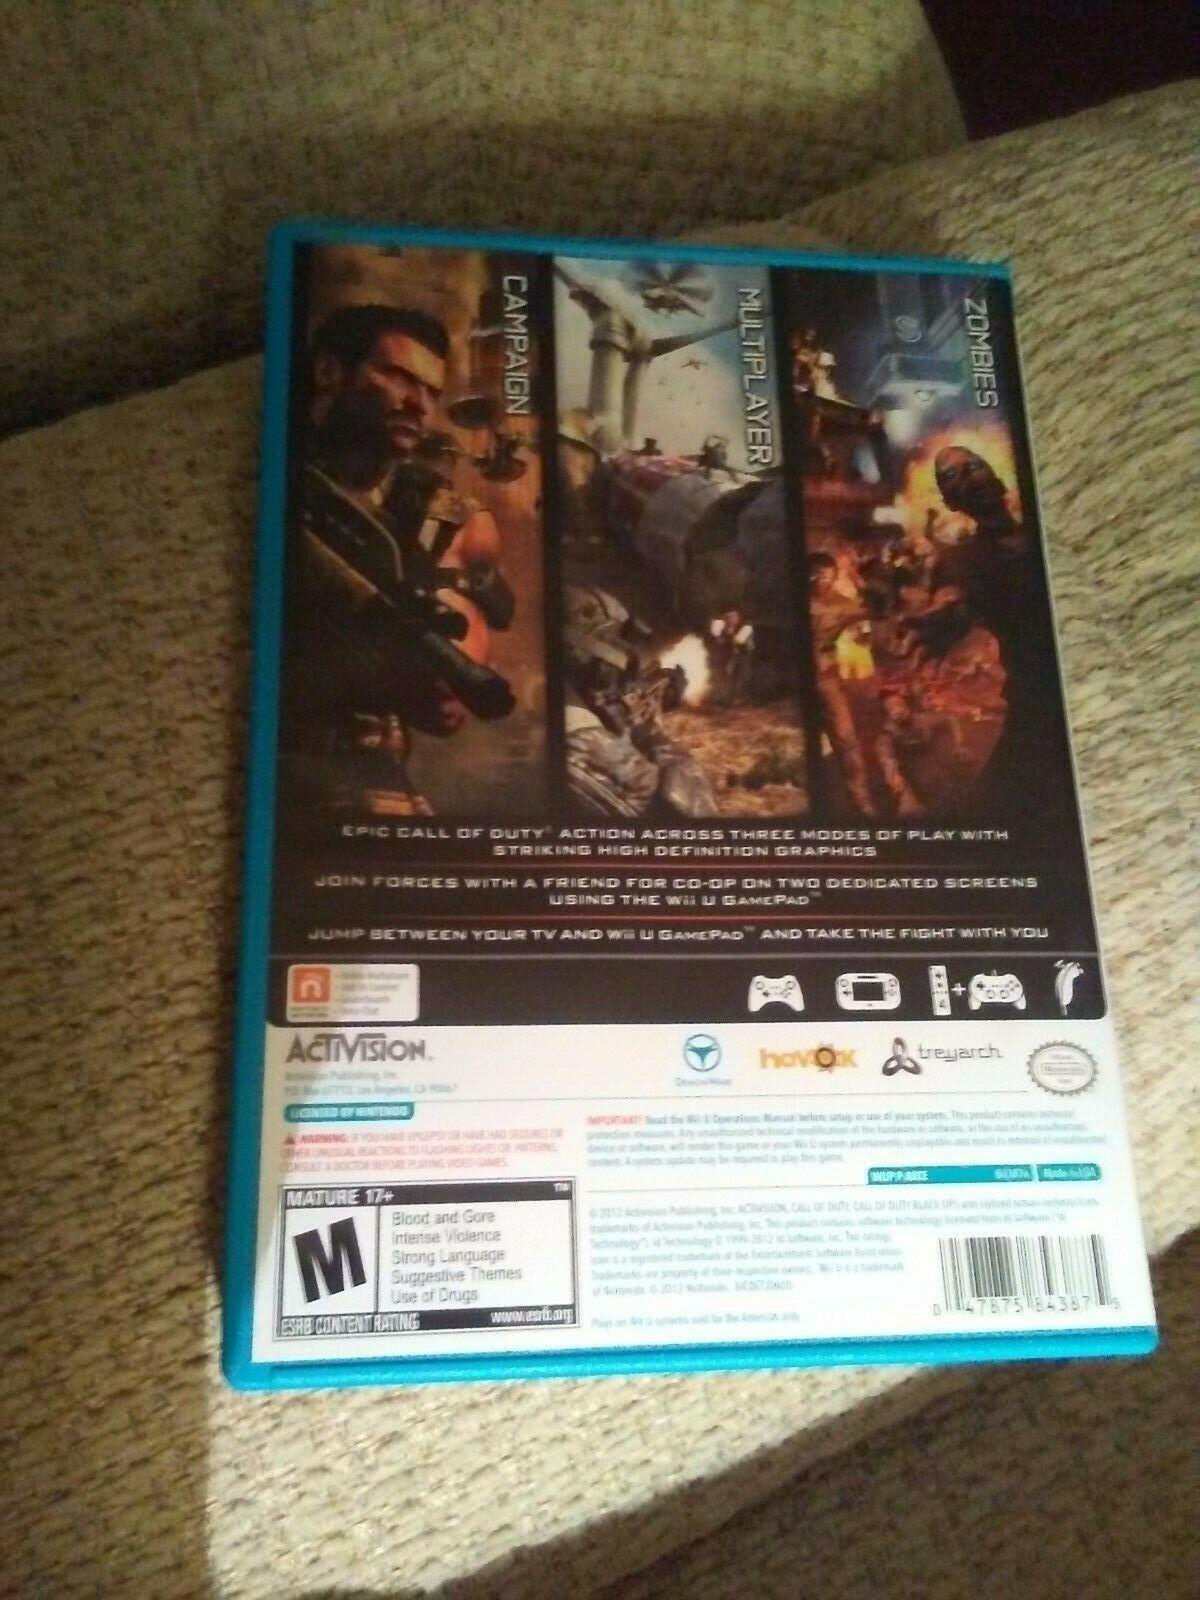 Call of Duty: Black Ops II (Nintendo Wii U, 2012) image 11